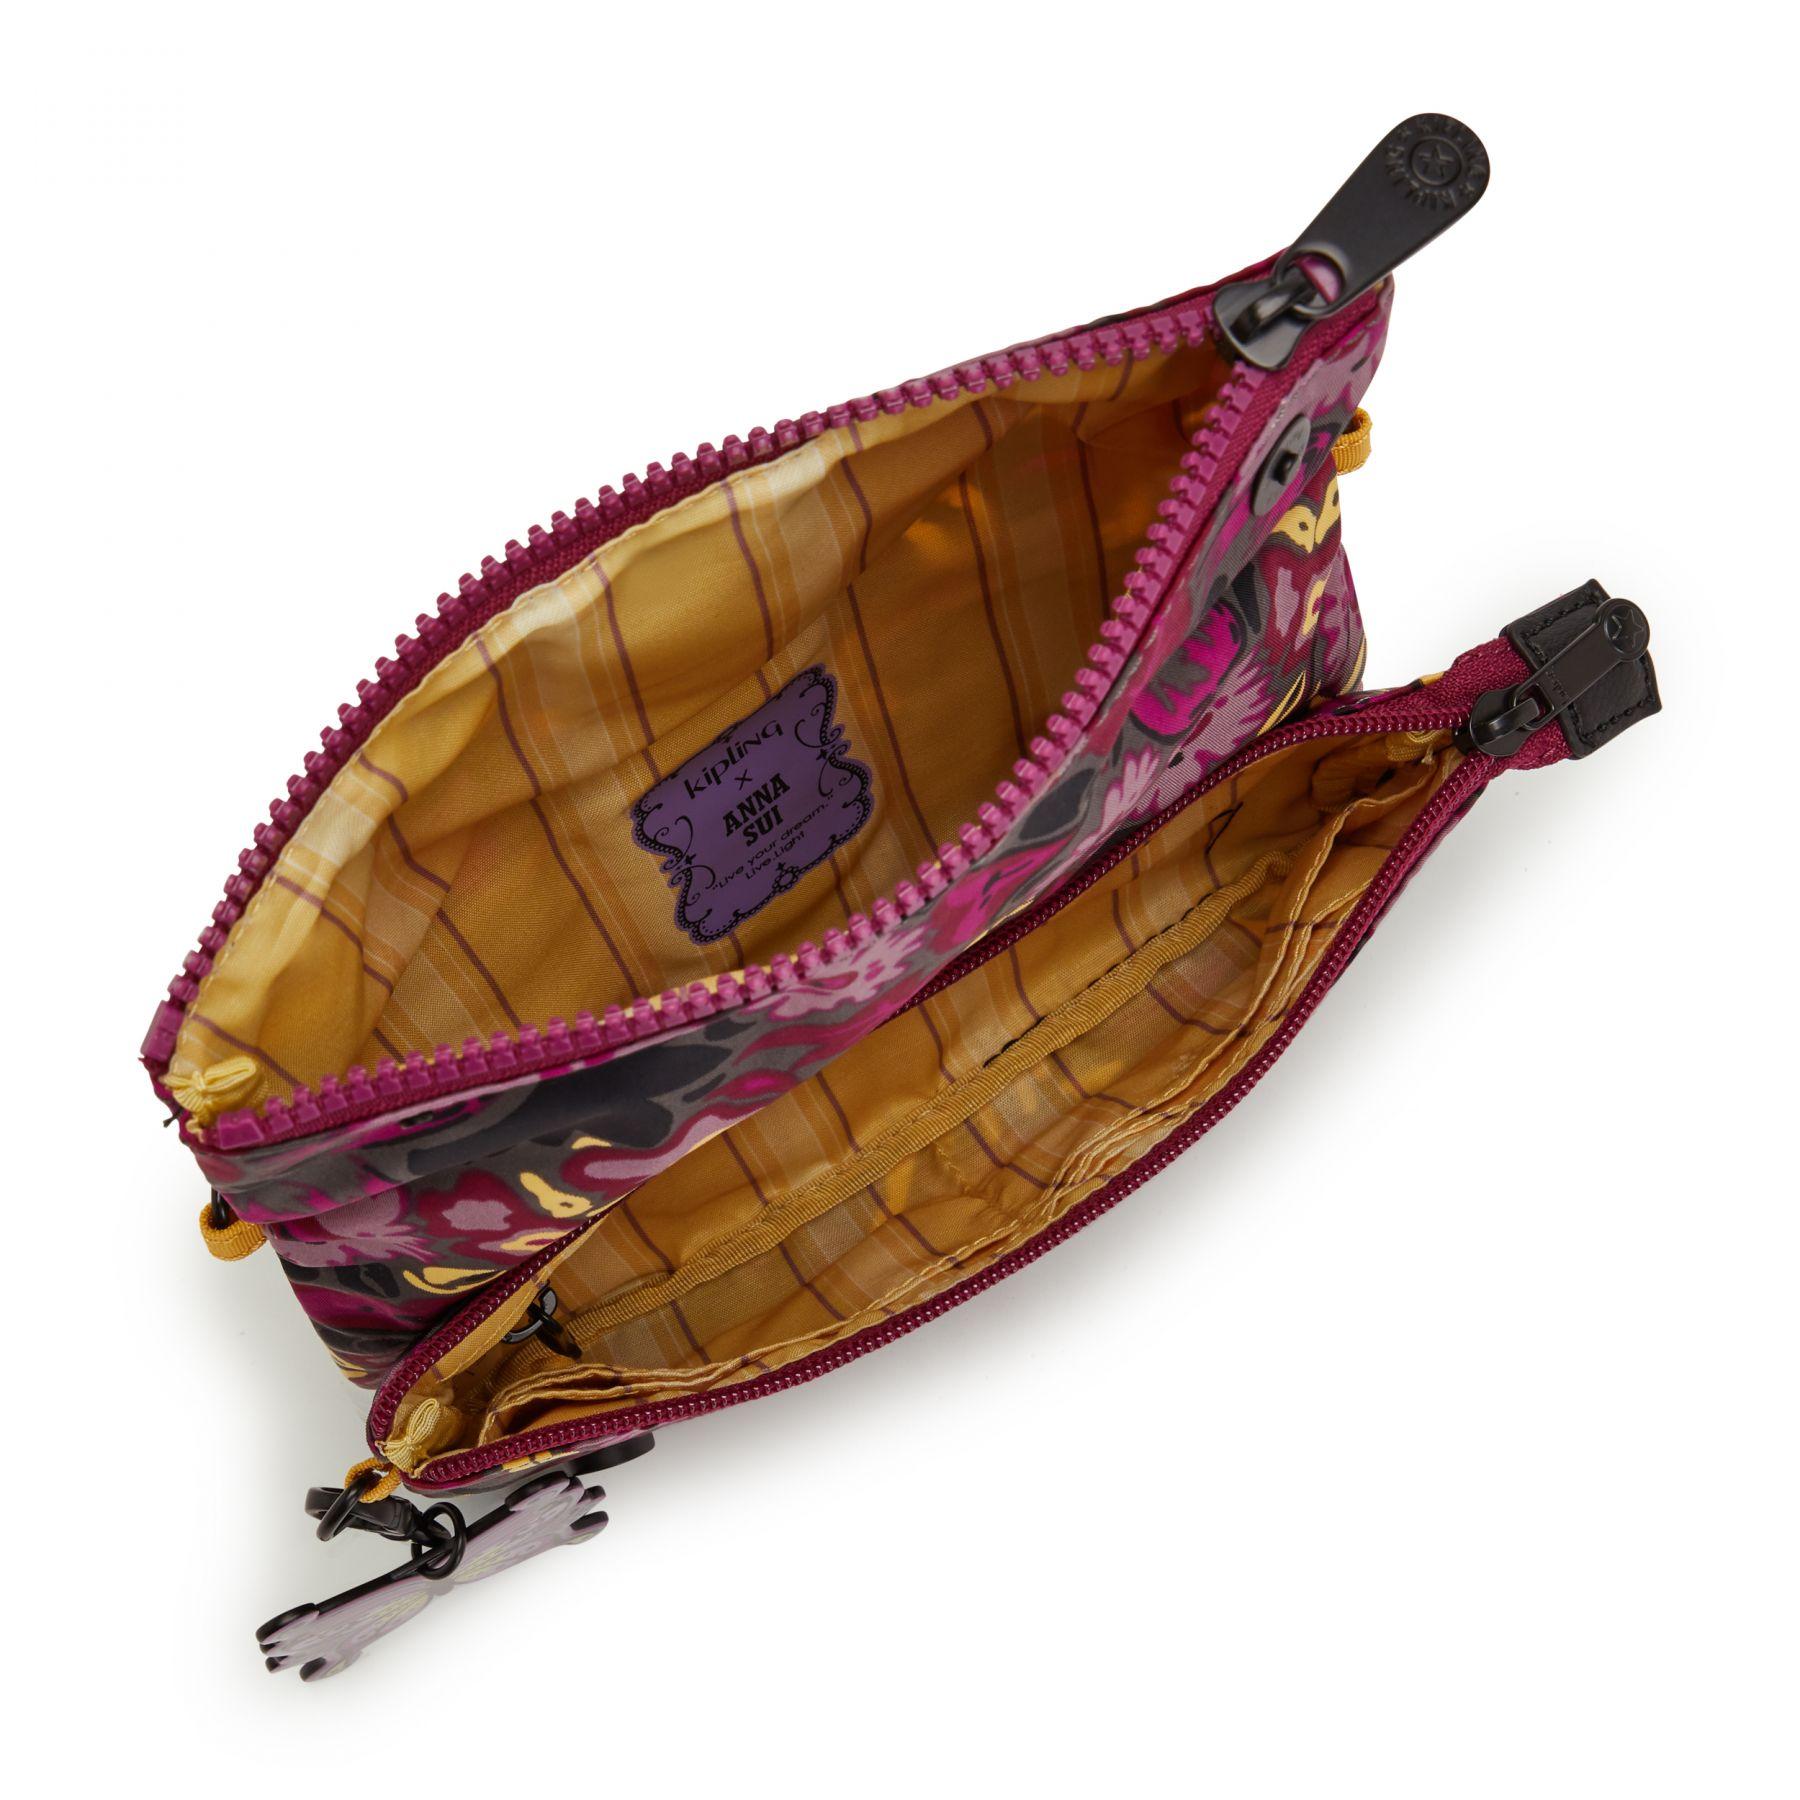 LYNNE BAGS by Kipling - Inside view